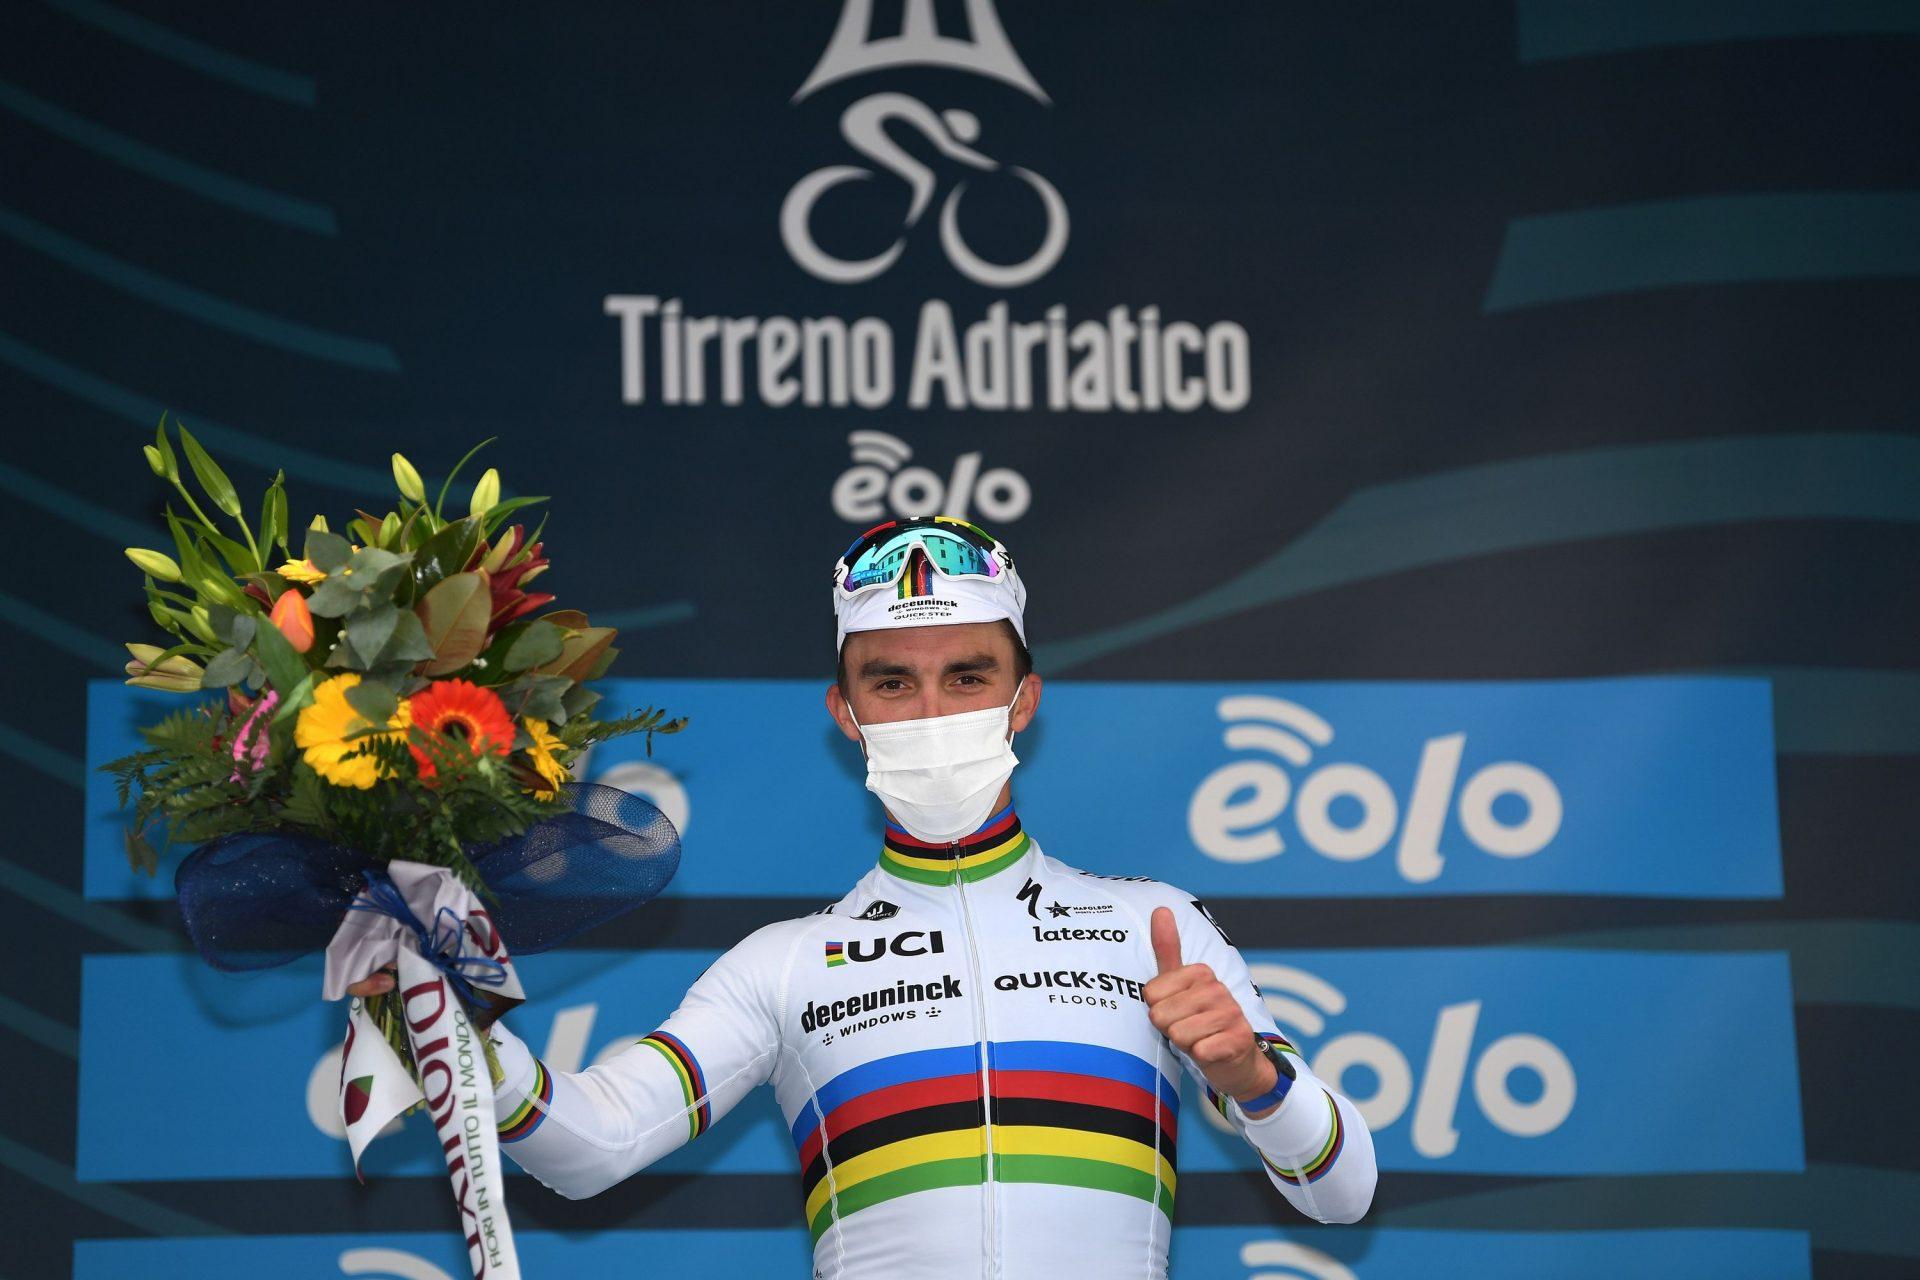 Julian Alaphilippe slaví etapový triumf při druhé etapě Tirreno-Adriatico. Foto: Deceuninck - Quick-Step - ©Tim De Waele / Getty Images